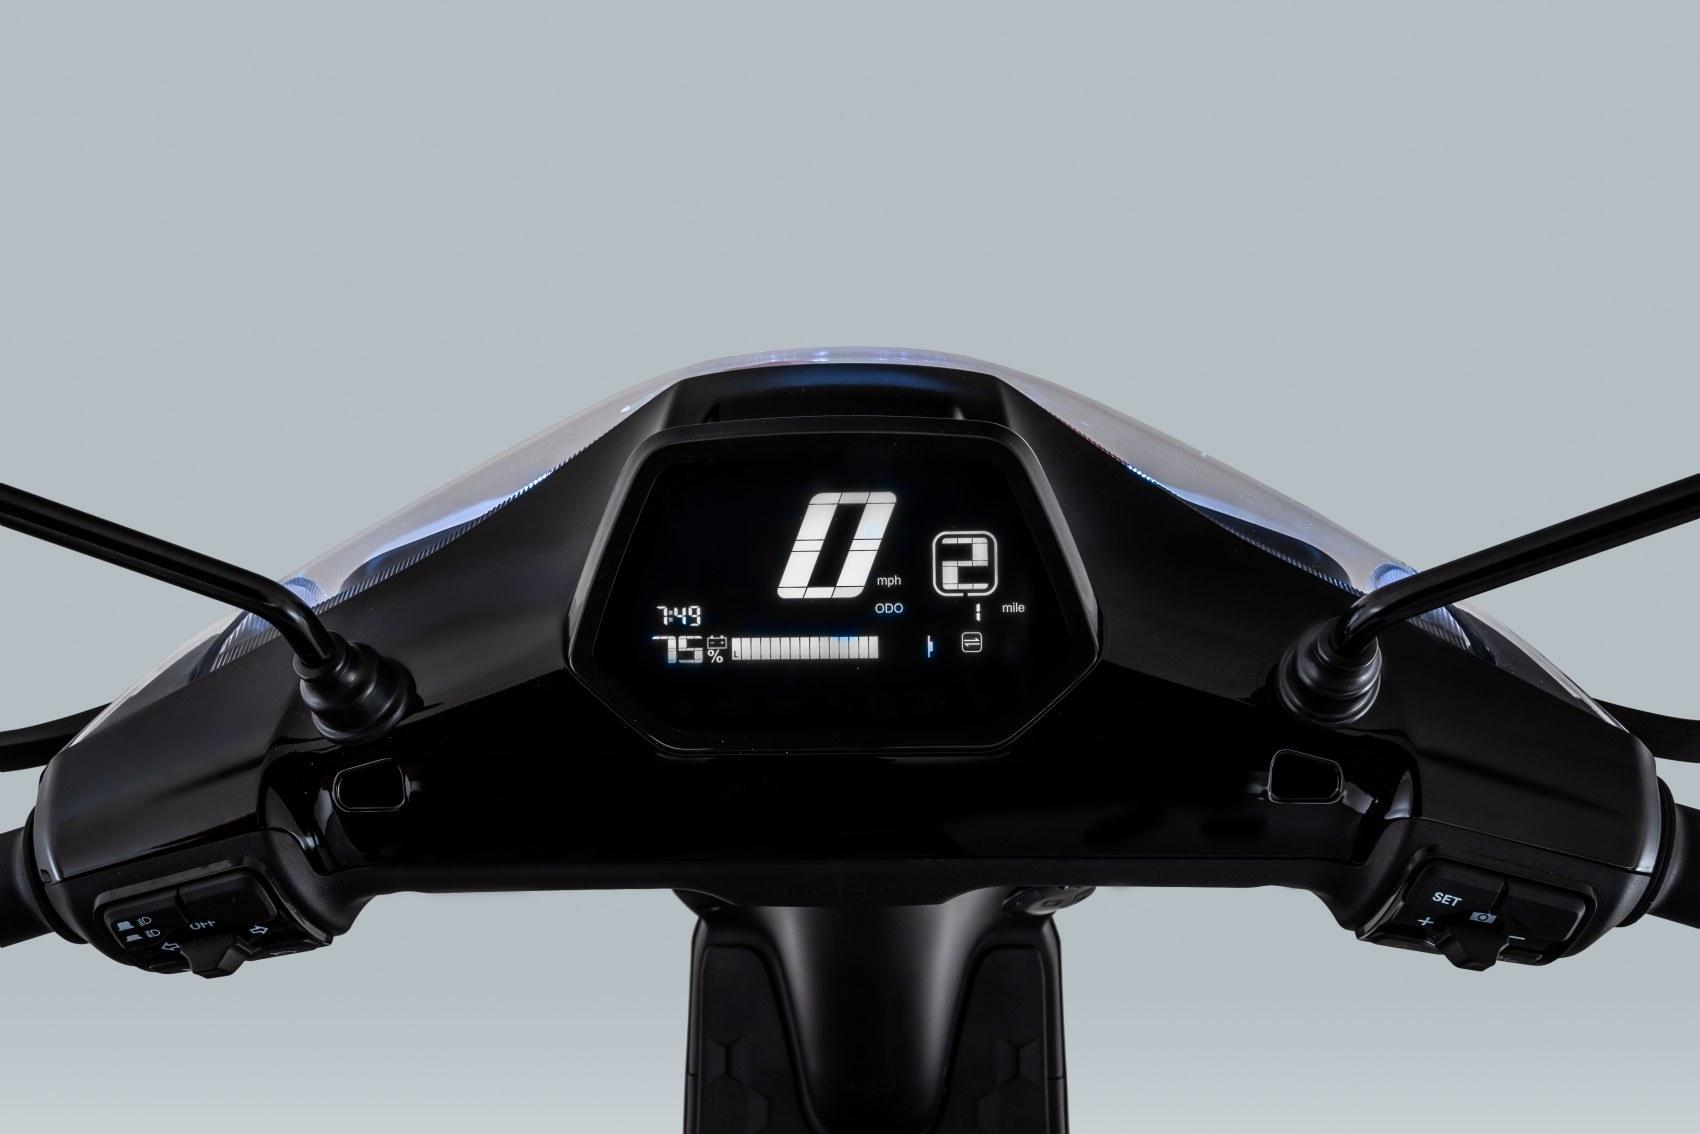 Super Soco CUx electric scooter digital display